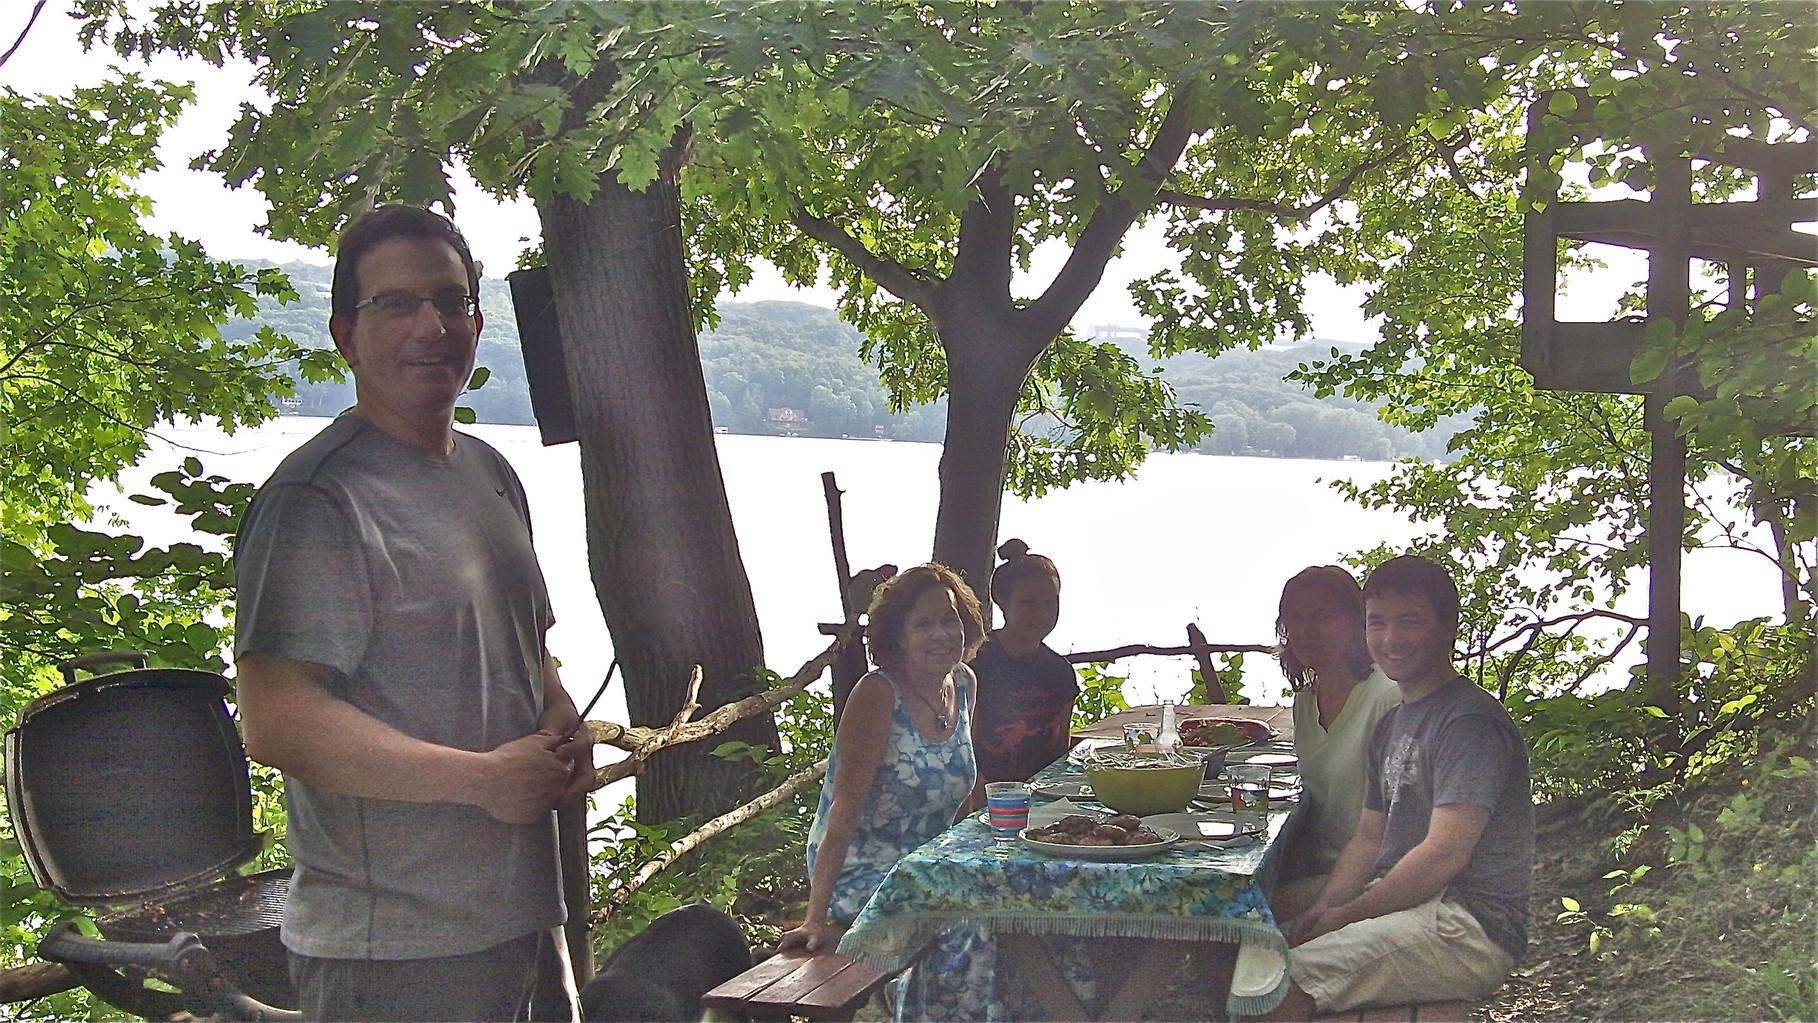 Nick, Lorraine, Sara, Cyndi & Trevan Skaneateles Picnic, August, 2014